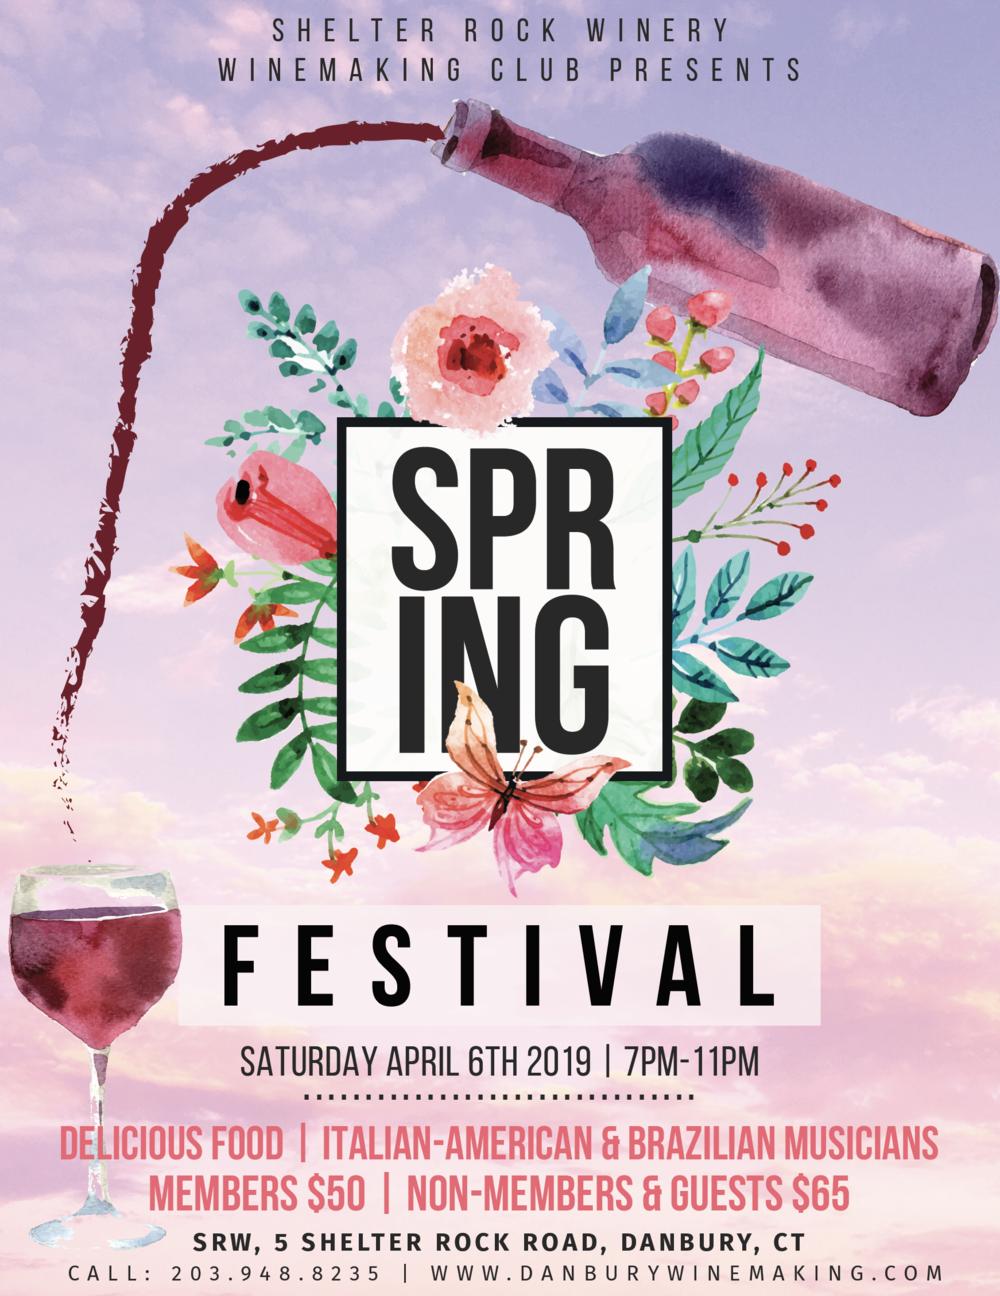 Spring Festival Danbury CT